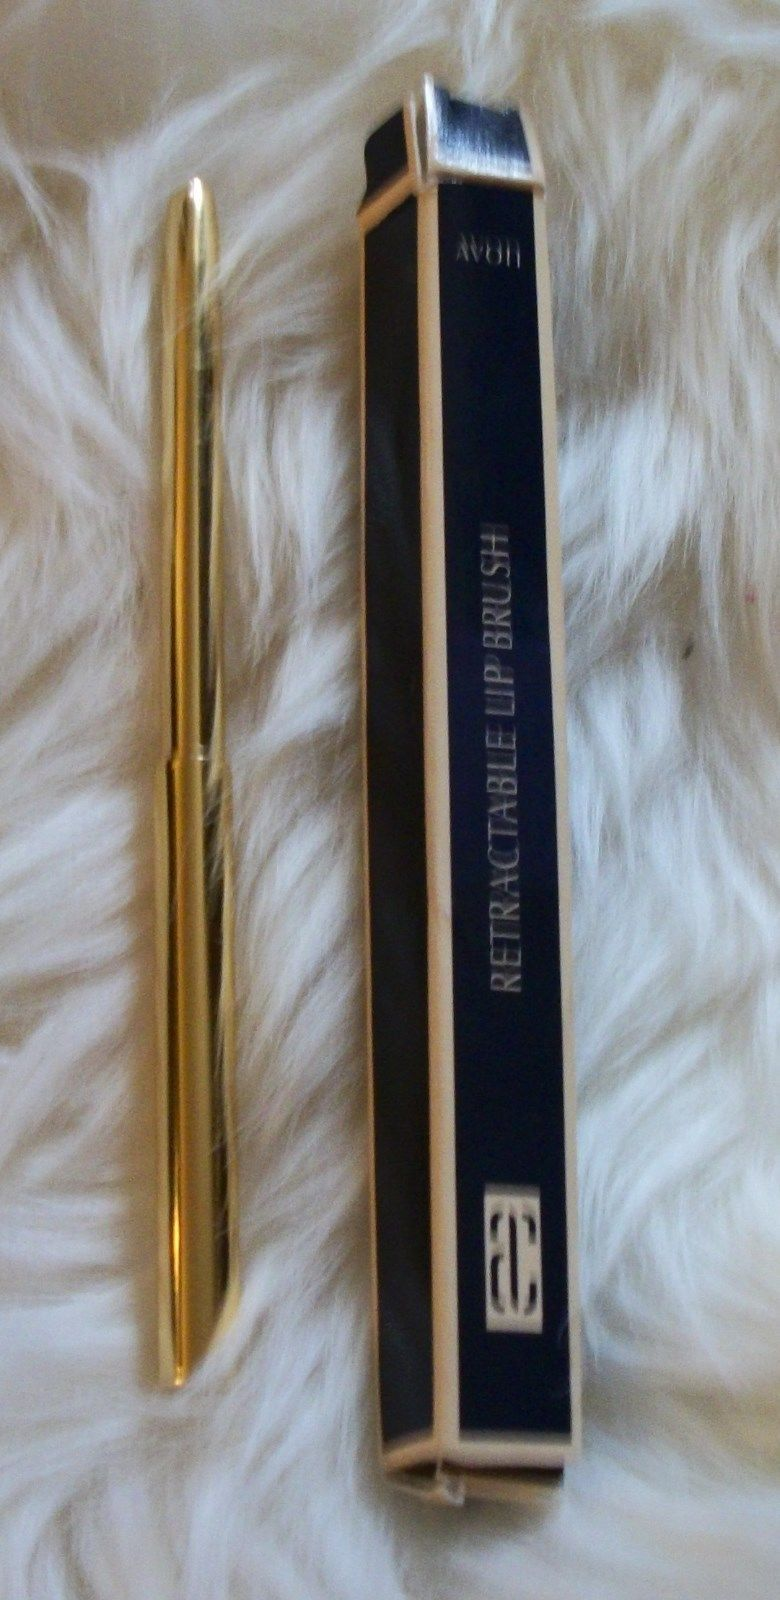 avon retractable lip brush new - $25.88